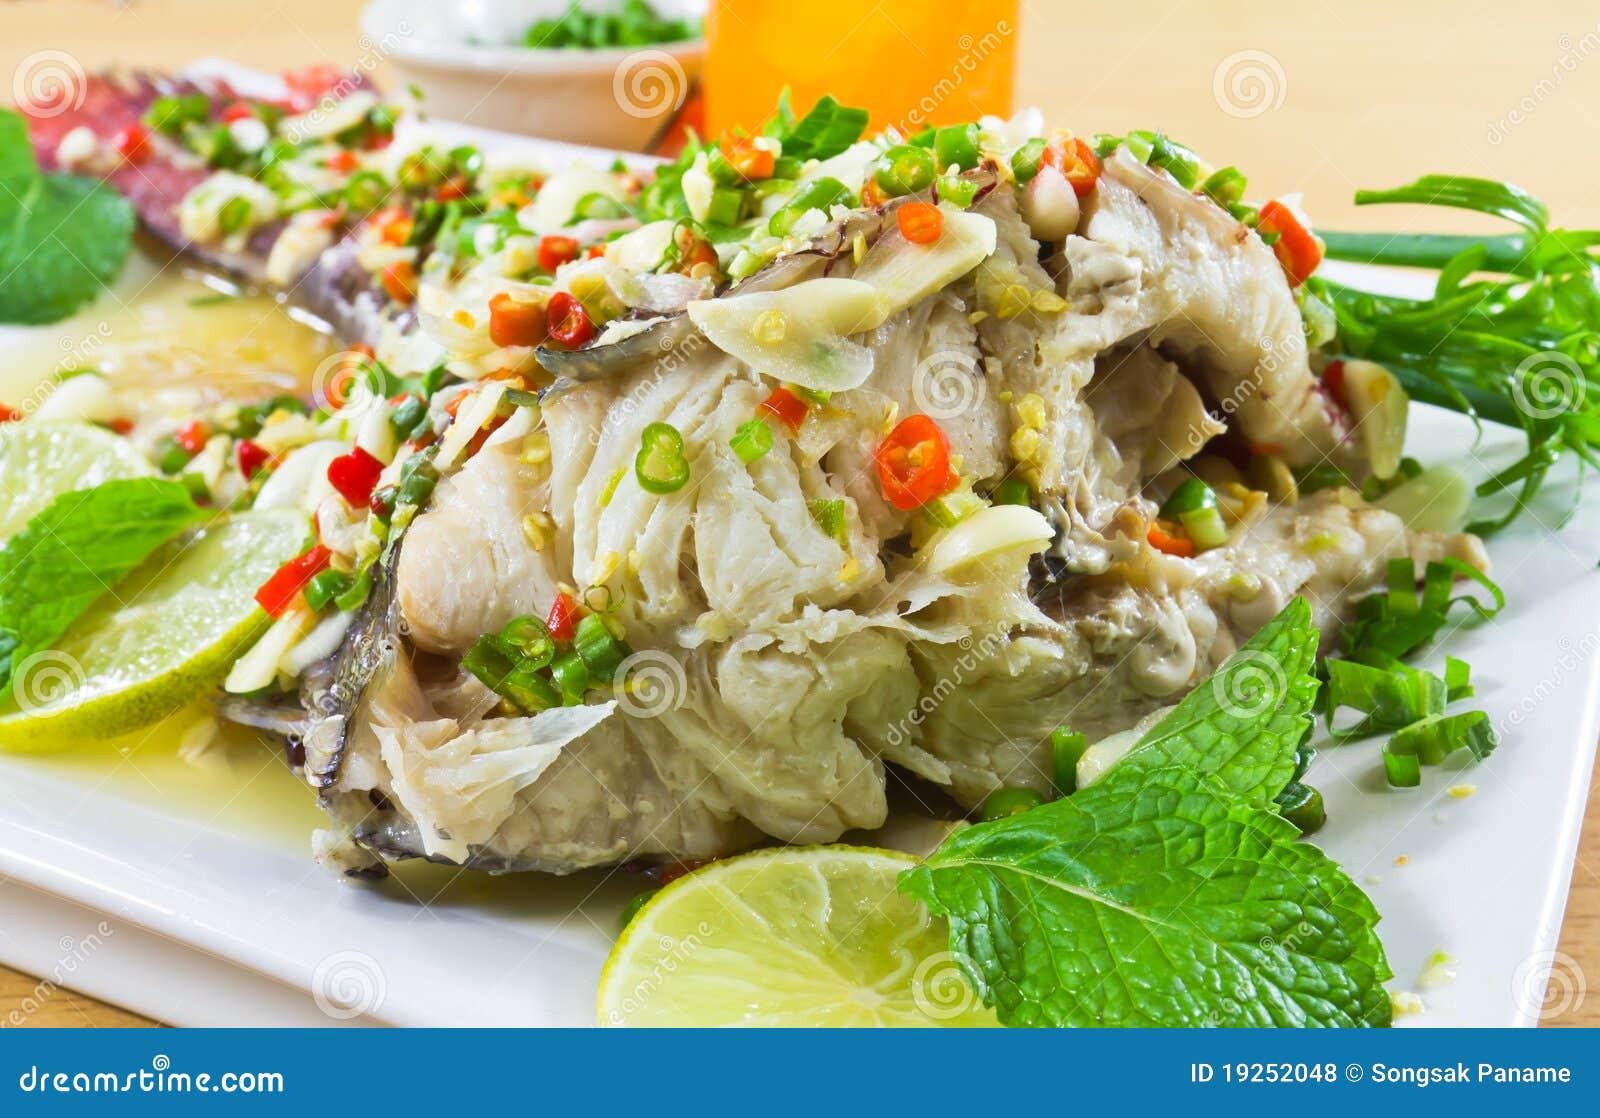 Thai Cuisine Royalty Free Stock Photos - Image: 19252048